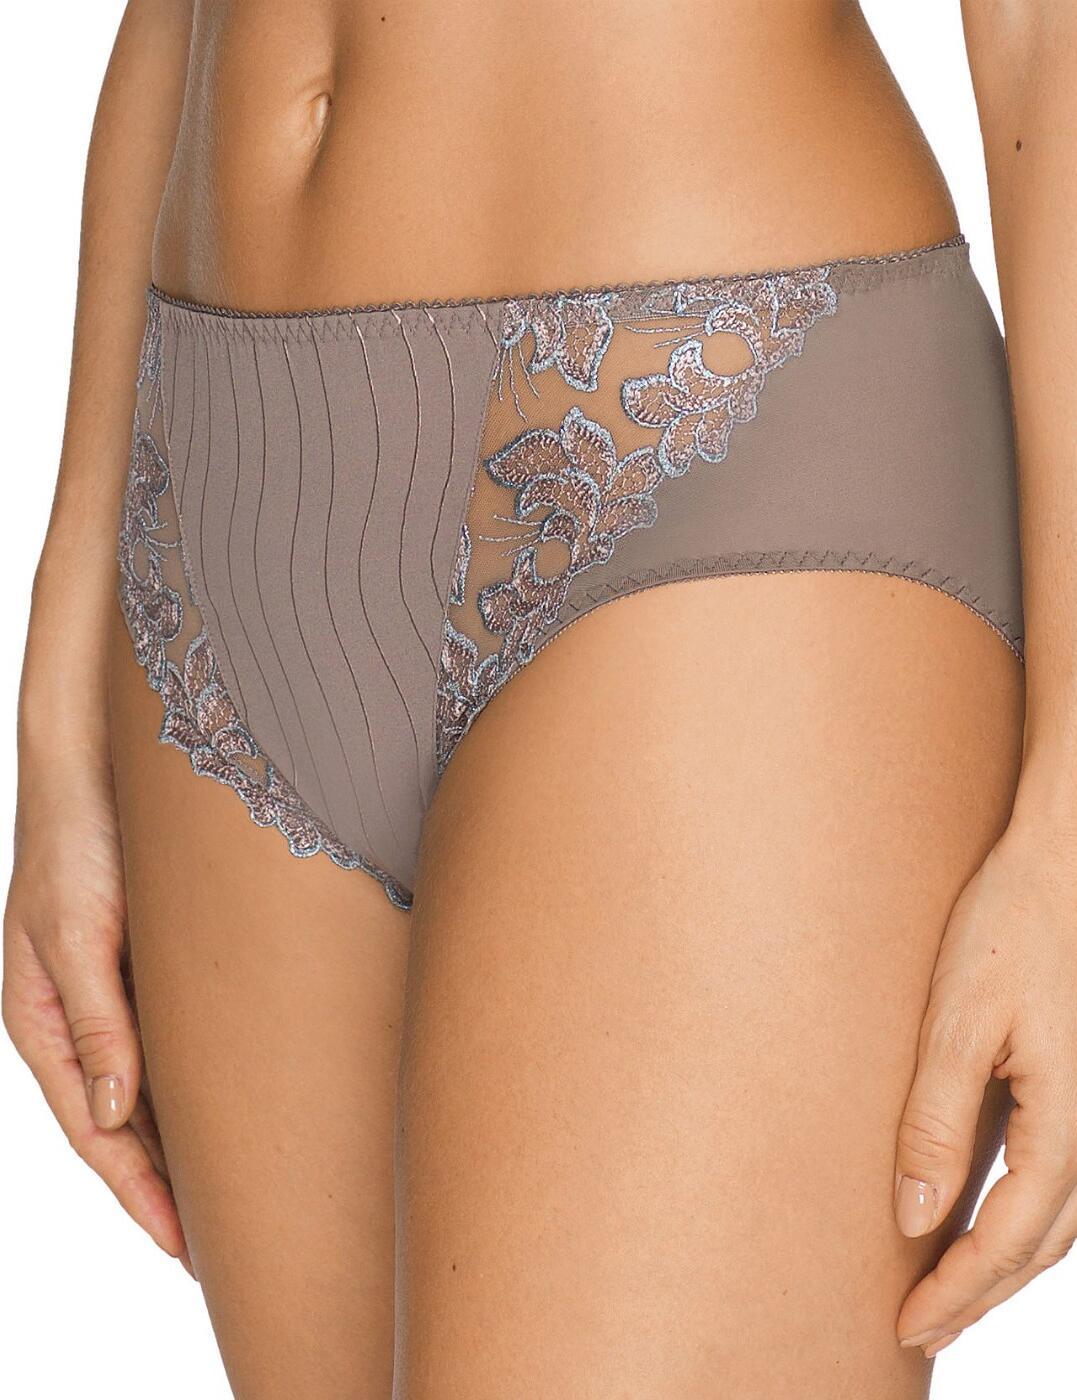 Prima-Donna-Deauville-Volle-Unterhose-Slip-Slips-Pant-0561811-Luxus-Dessous Indexbild 26